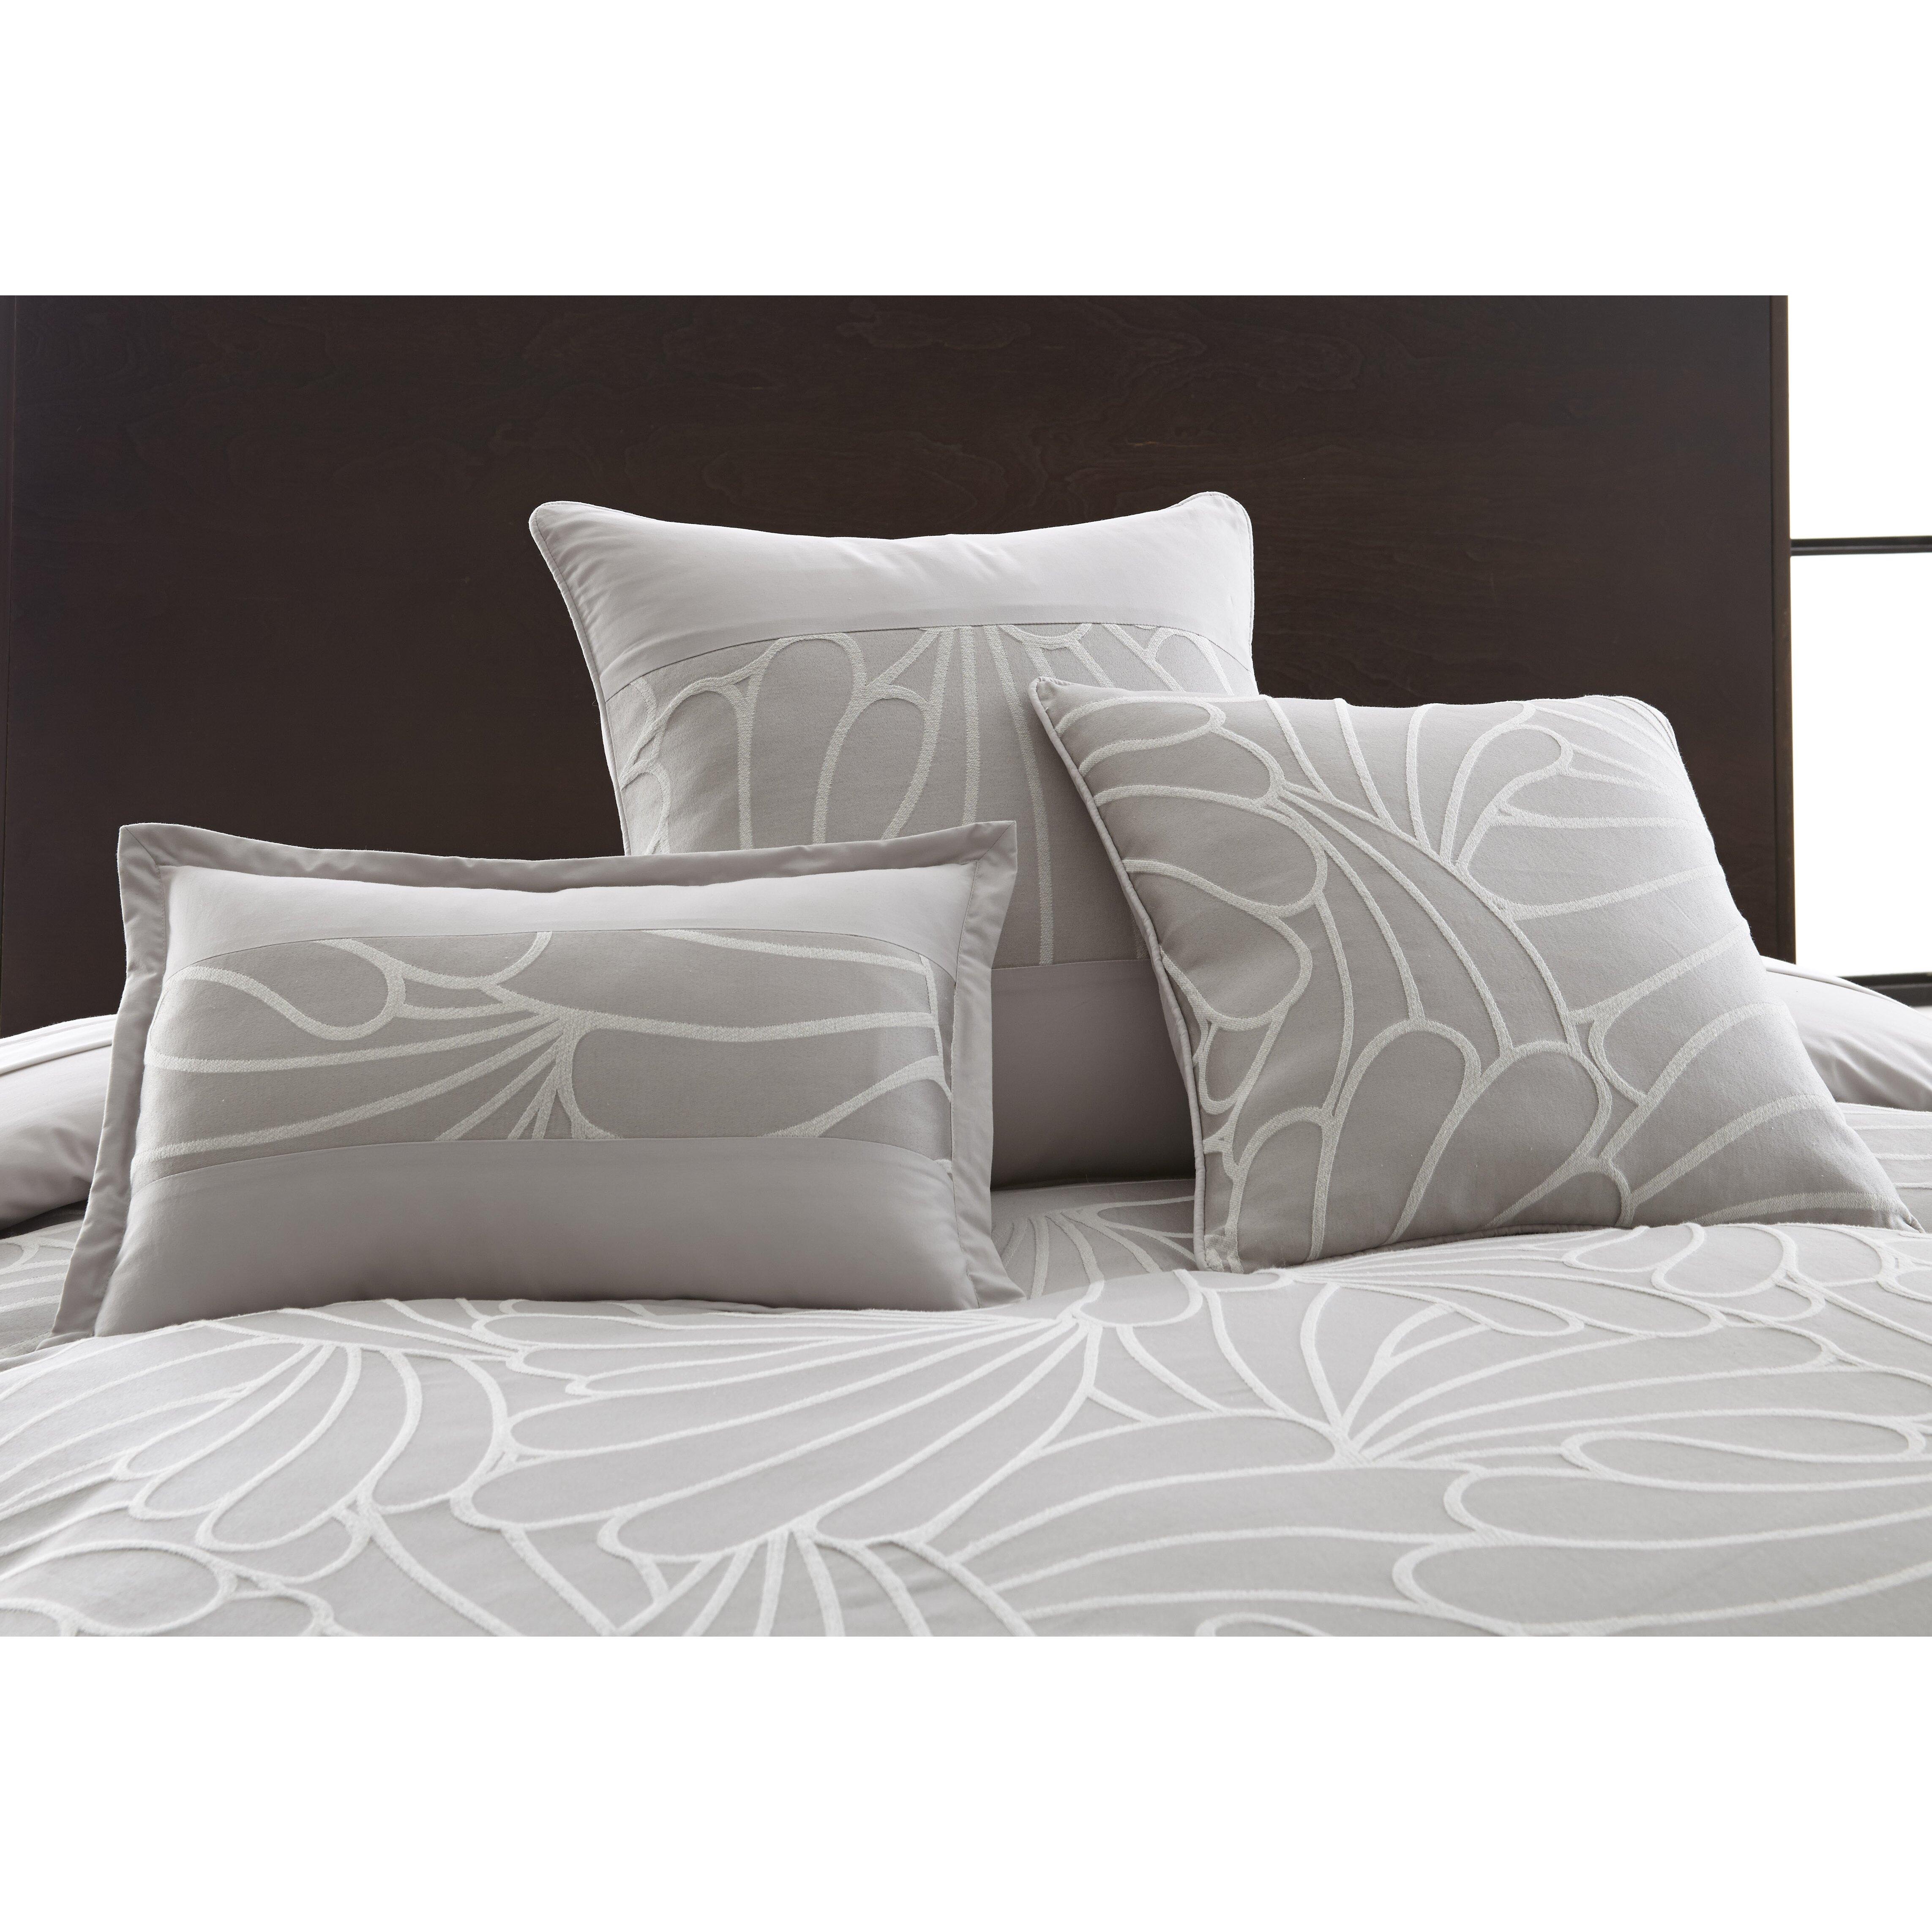 Decorative Pillow Sets : Amrapur Mandalay Bay 3 Piece Kate Jacquard Decorative Cotton Breakfast and Throw Pillow Set ...